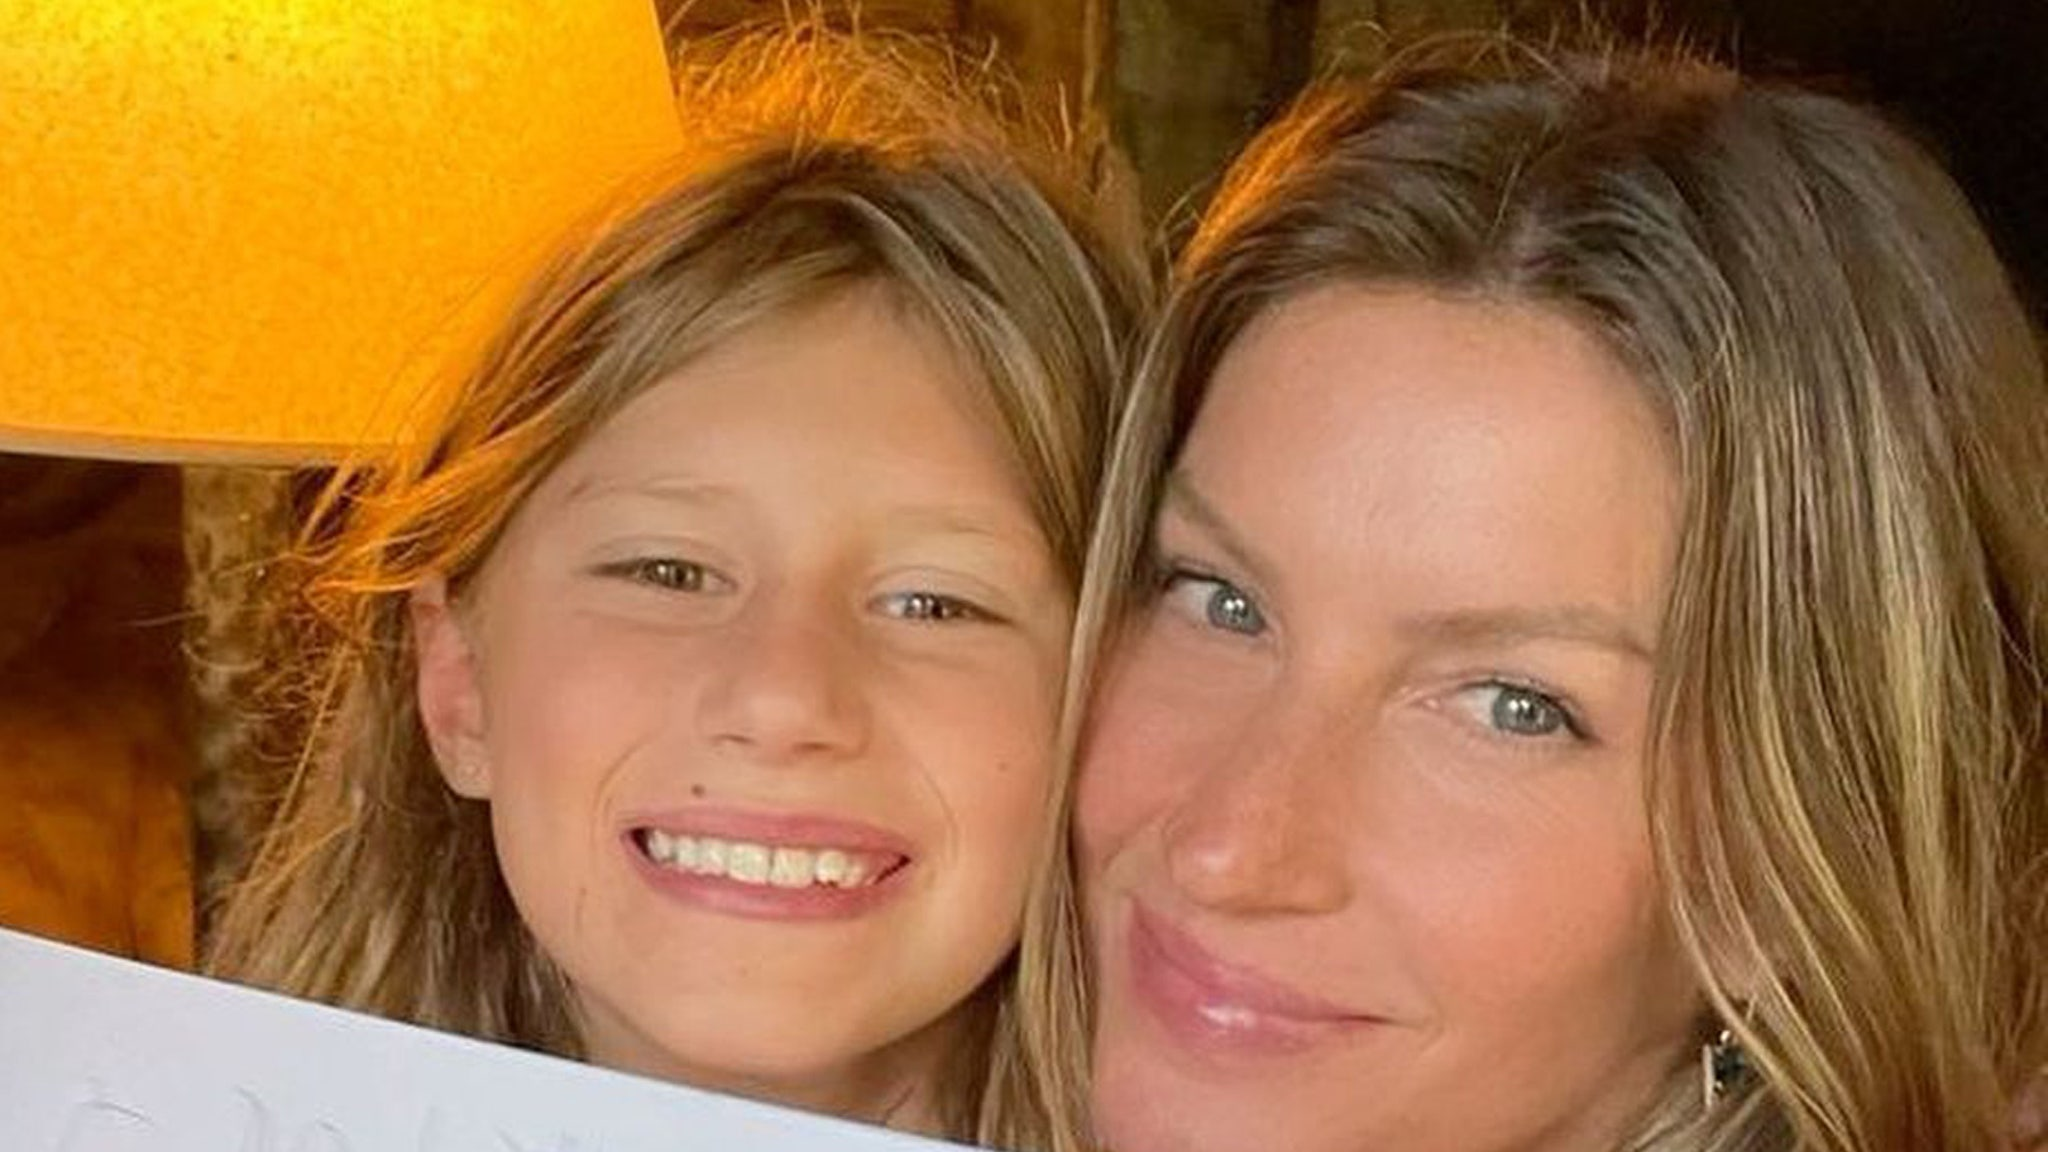 Gisele Bundchen celebrates her 41st birthday with her family